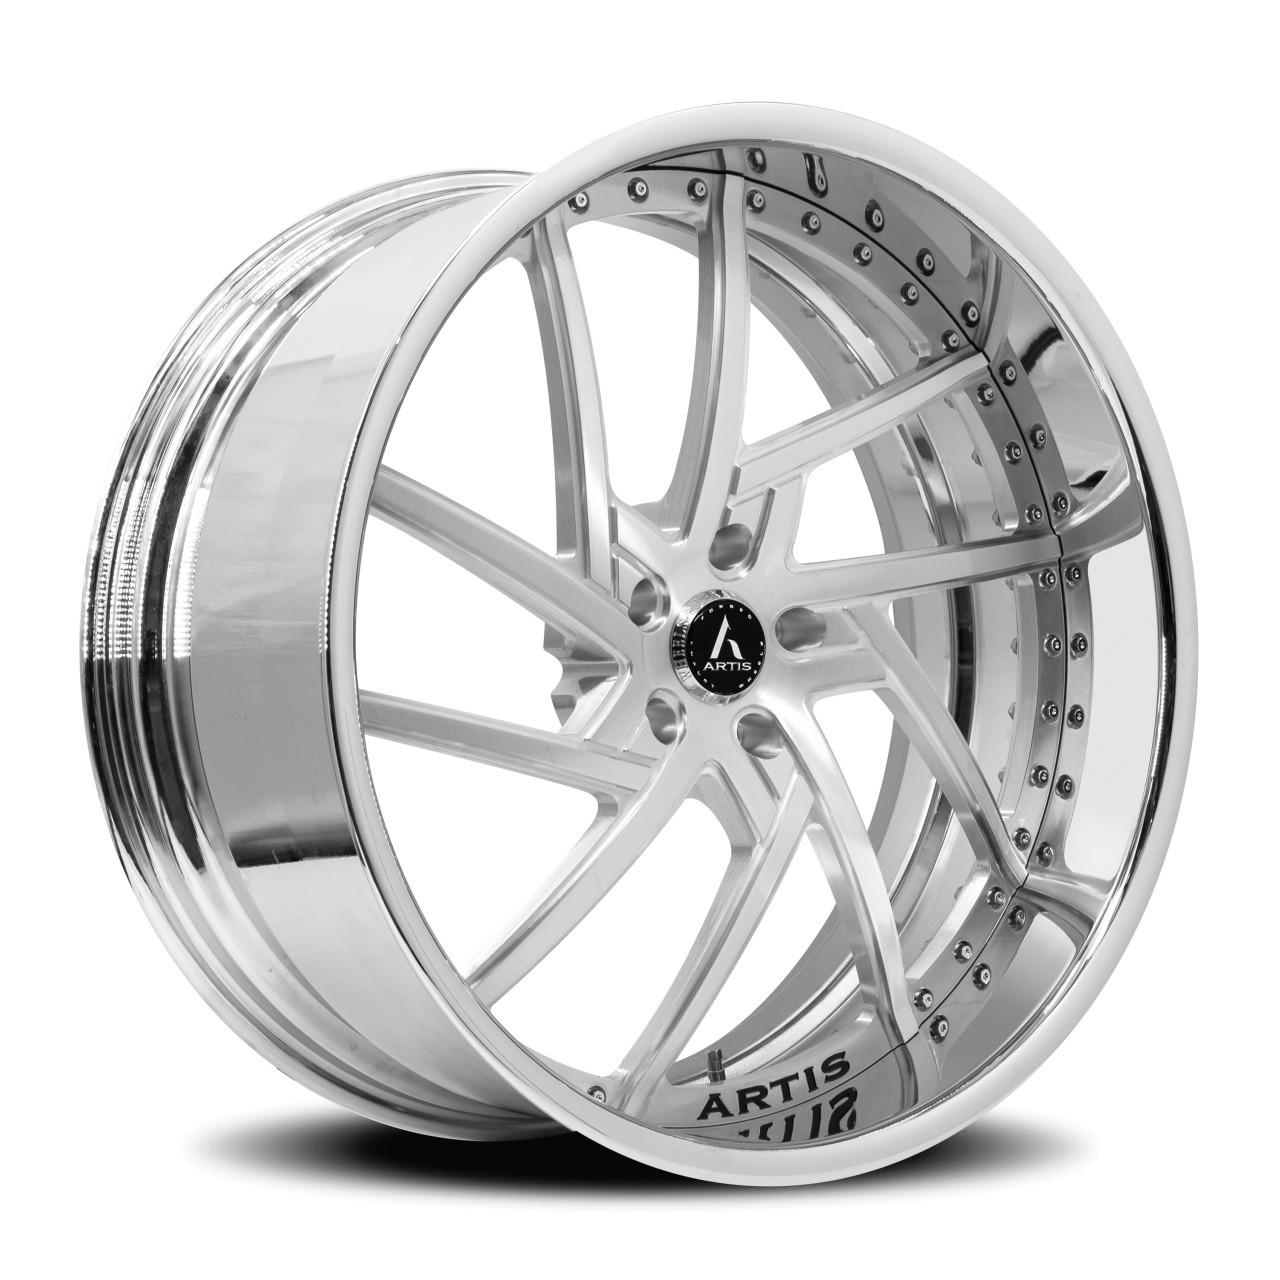 Artis Fairfax forged wheels